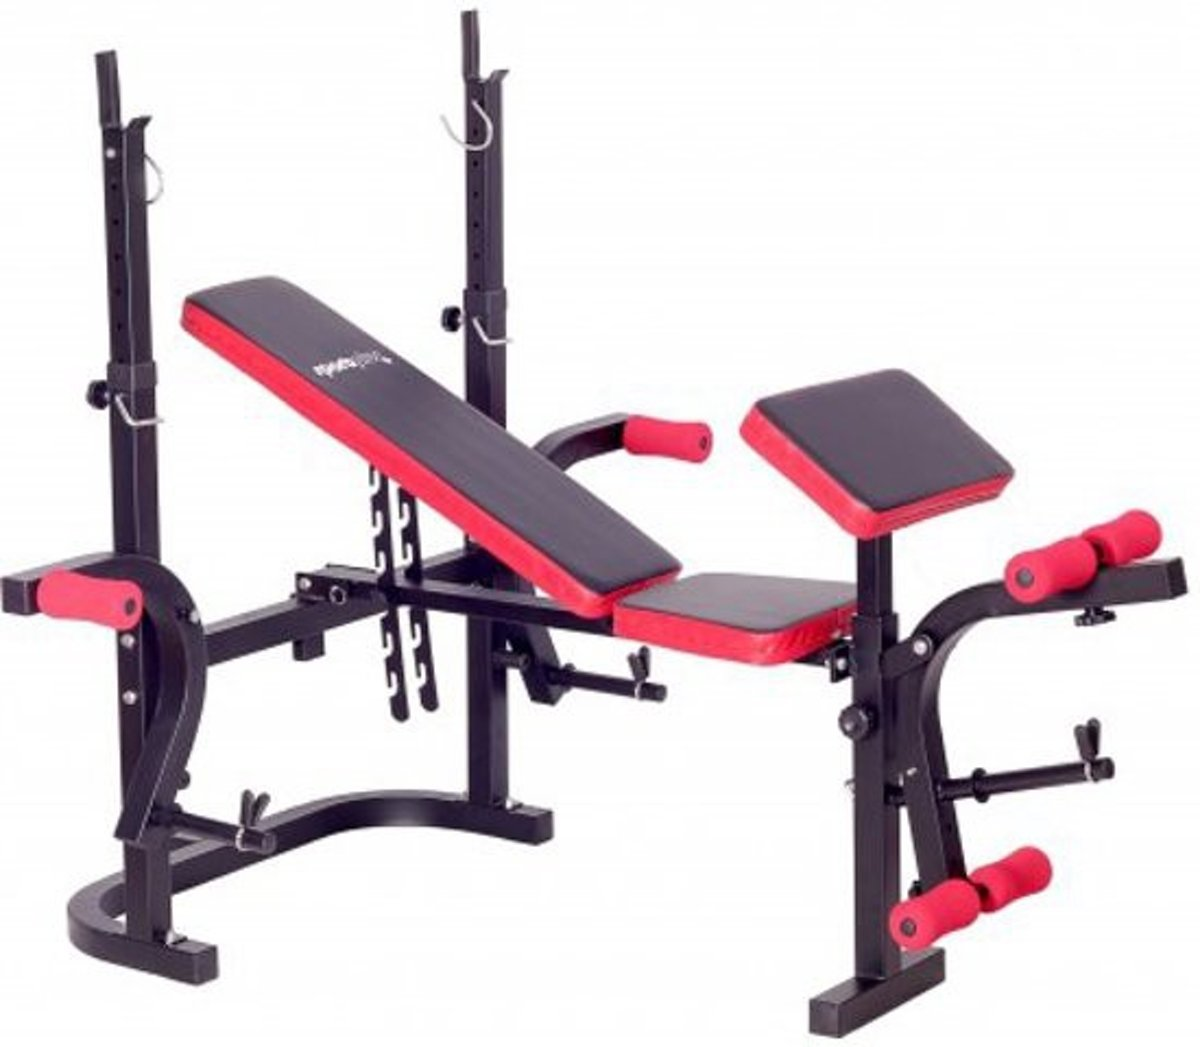 SP-WB-003-B SportPlus Weight Bench kopen